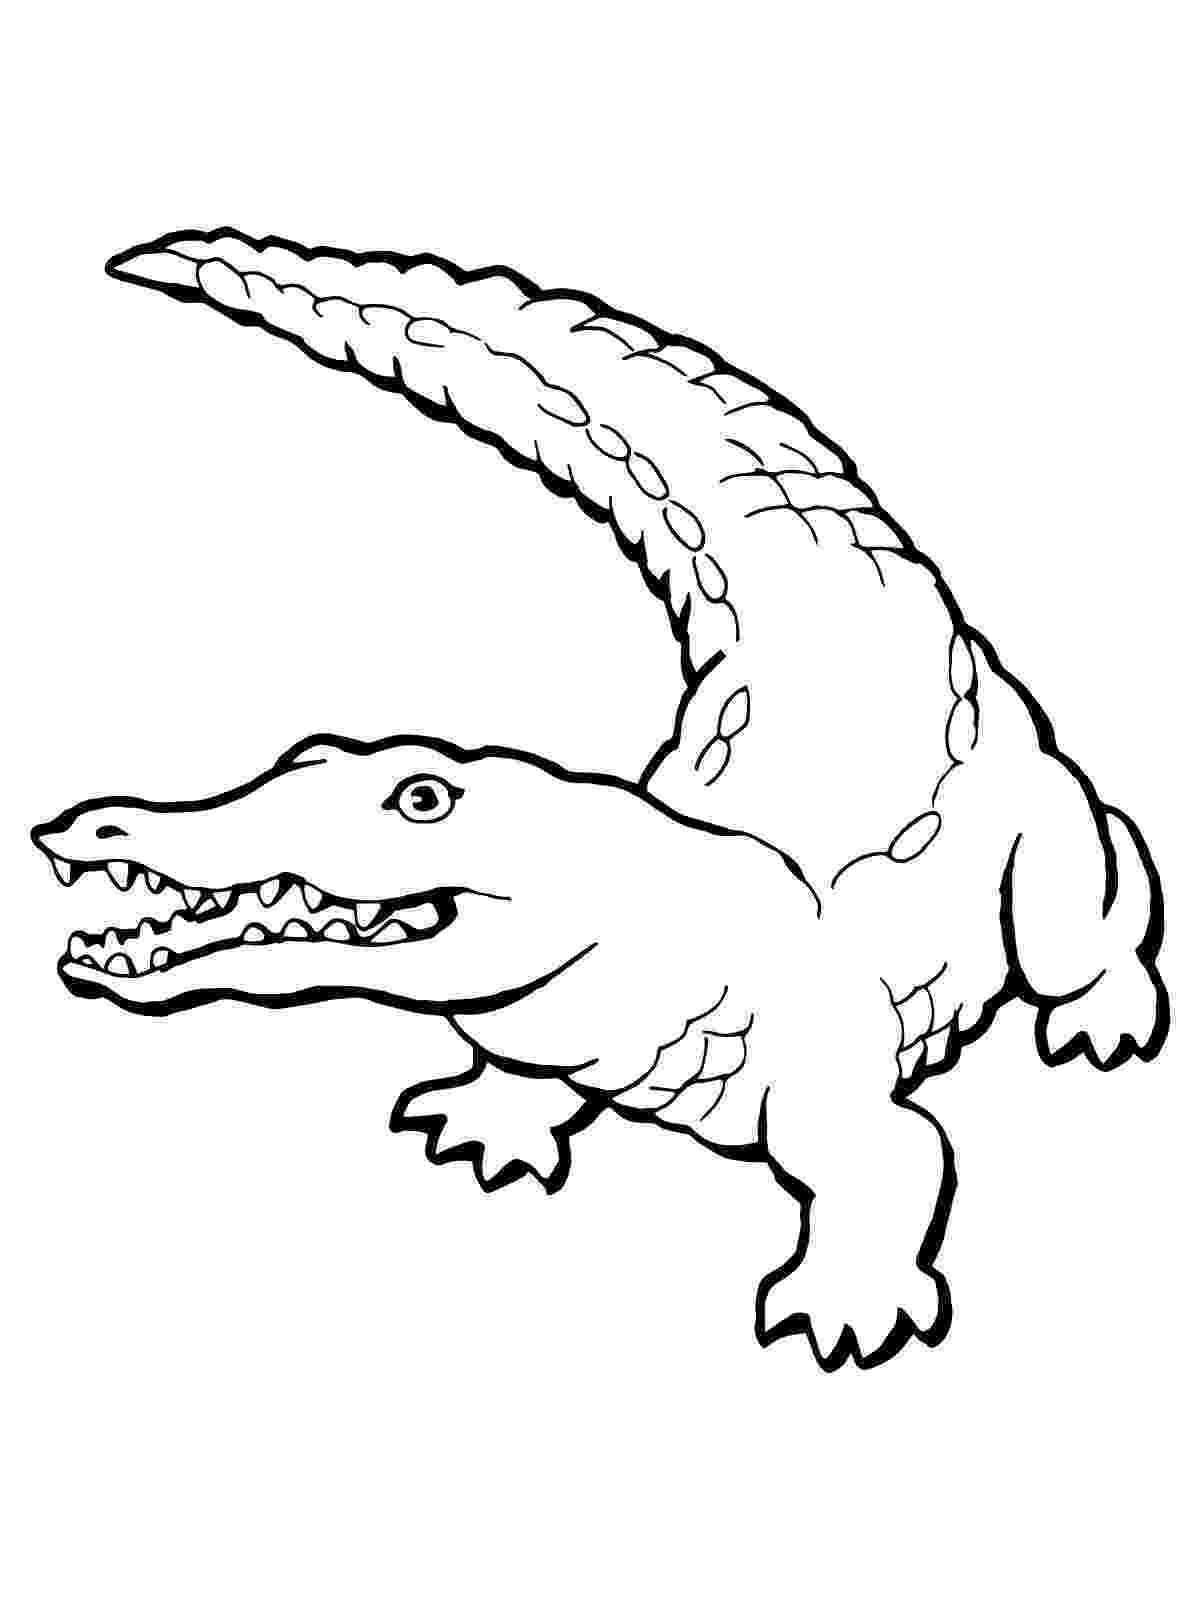 crocodile colouring page crocodile coloring pages coloring pages to download and colouring crocodile page